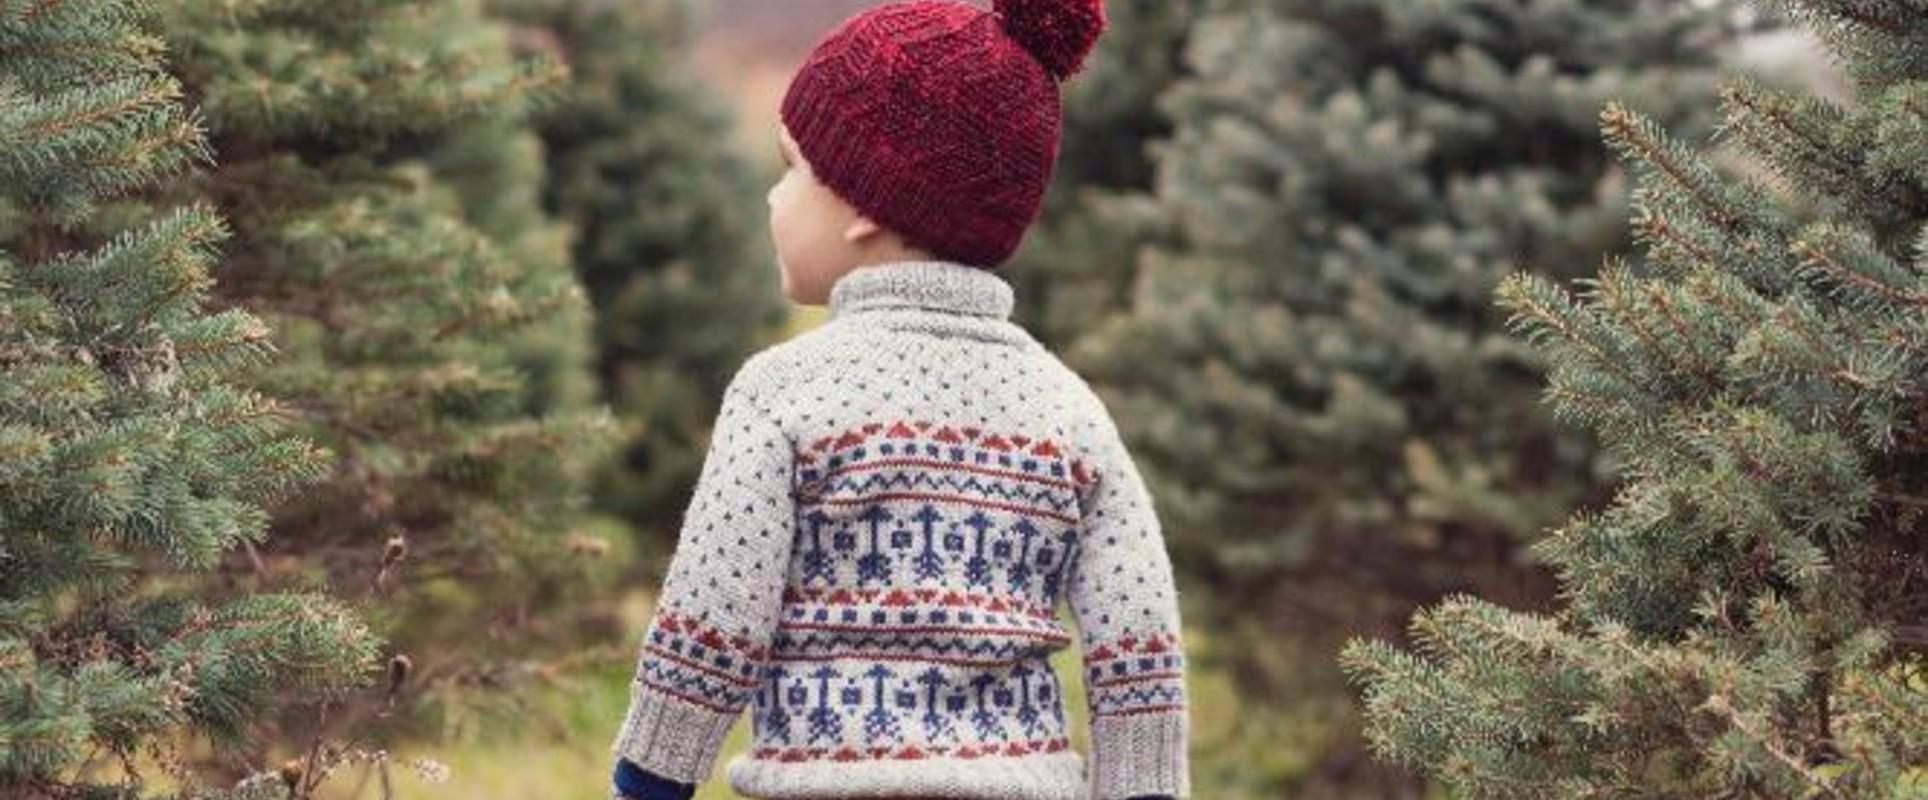 10 Christmas Sweater Knitting Patterns Loveknitting